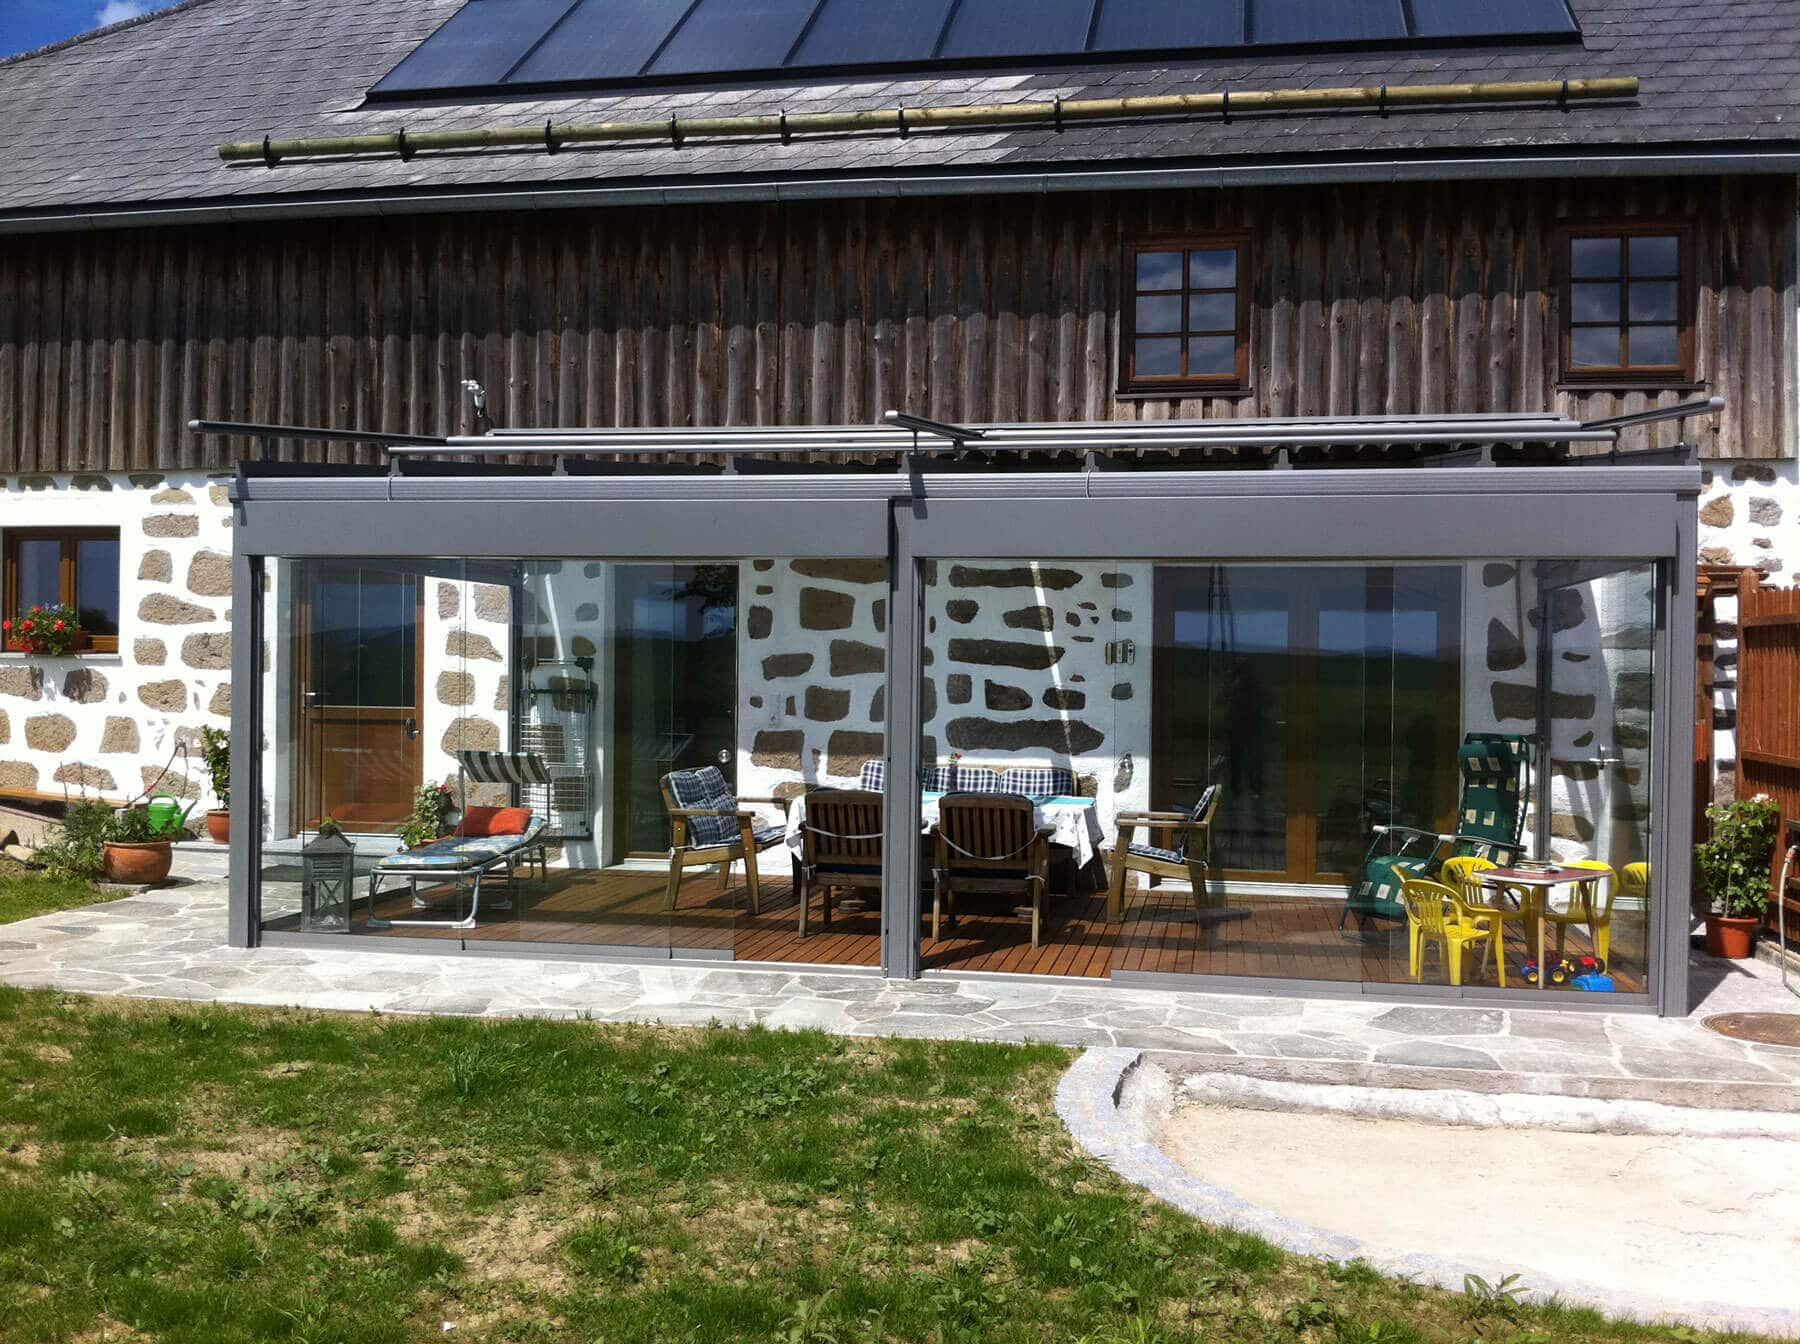 Terrassenüberdachung Alu Mit Beschattung Preis - Fenster Schmidinger